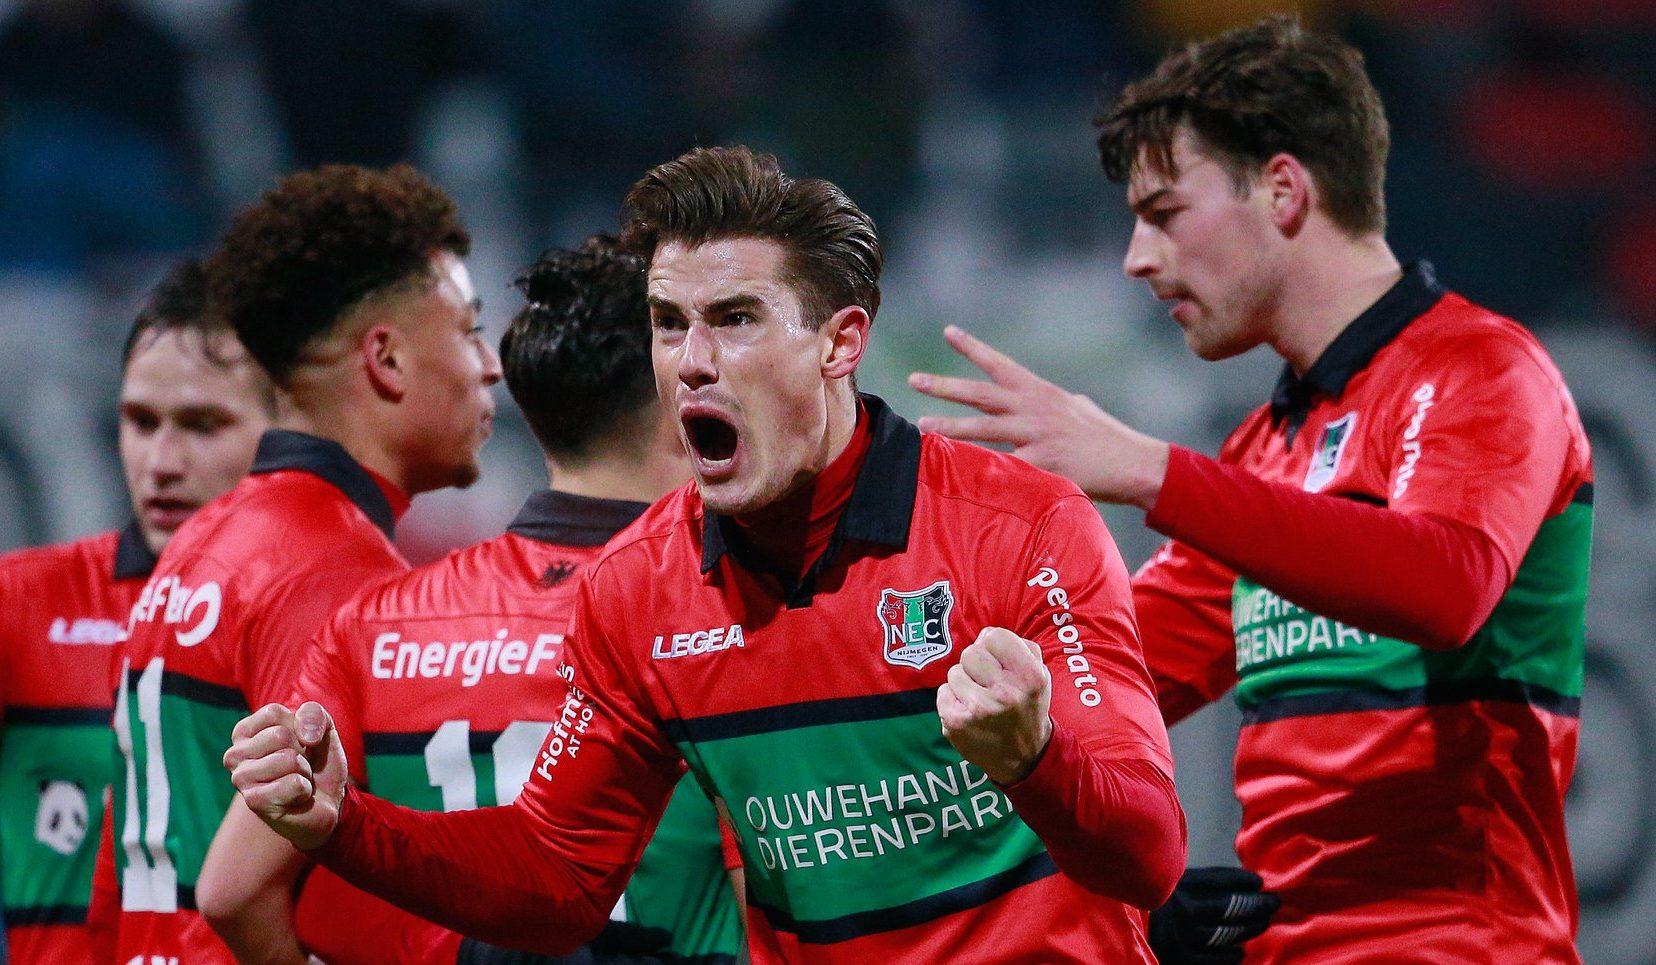 Eerste Divisie, Nijmegen-Almere: locali con difesa ballerina